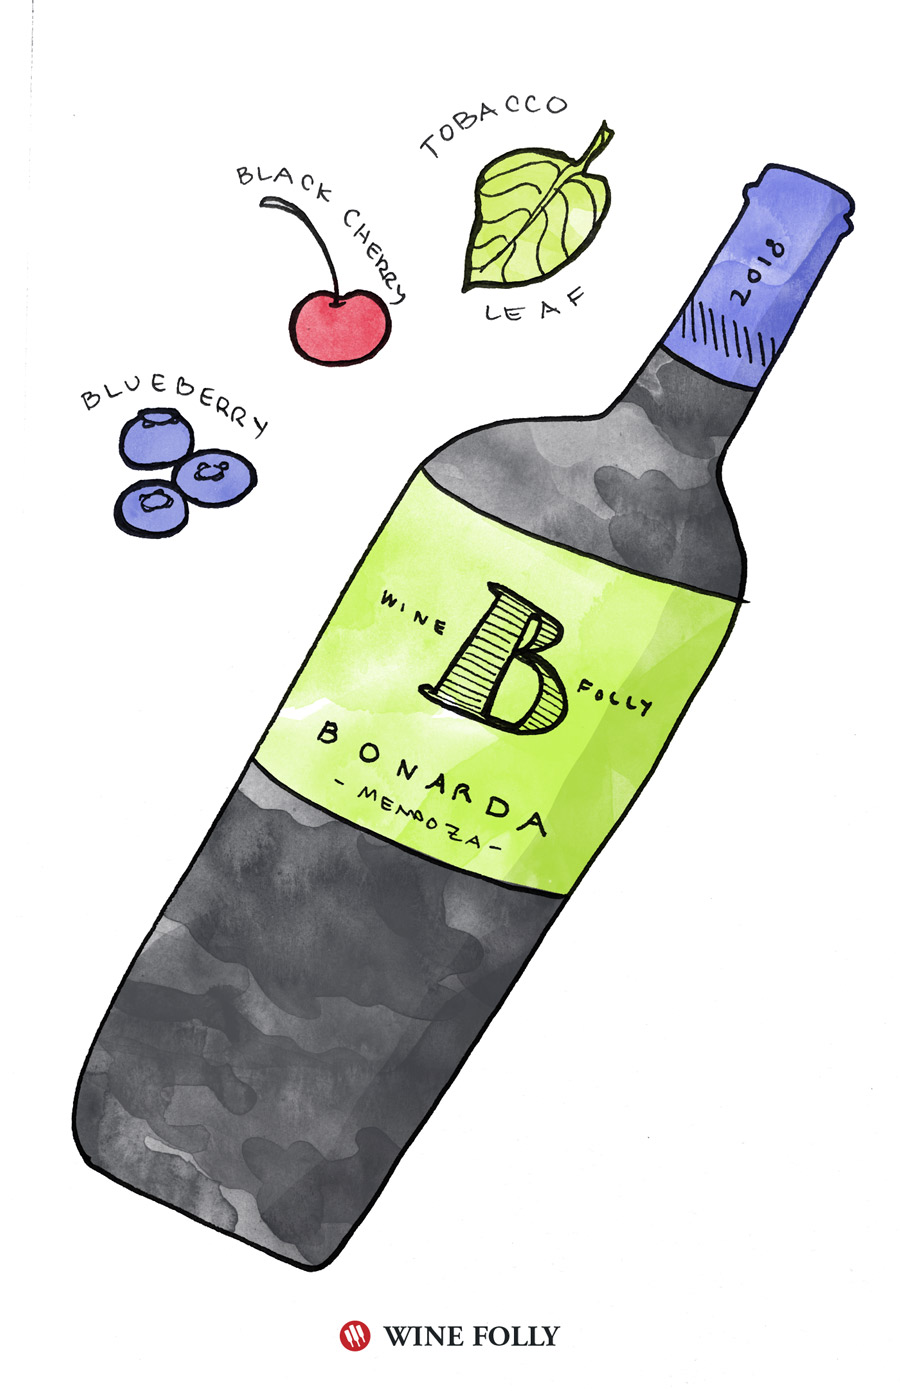 Bonarda Wine Recommendation for Spring Illustration by Wine Folly